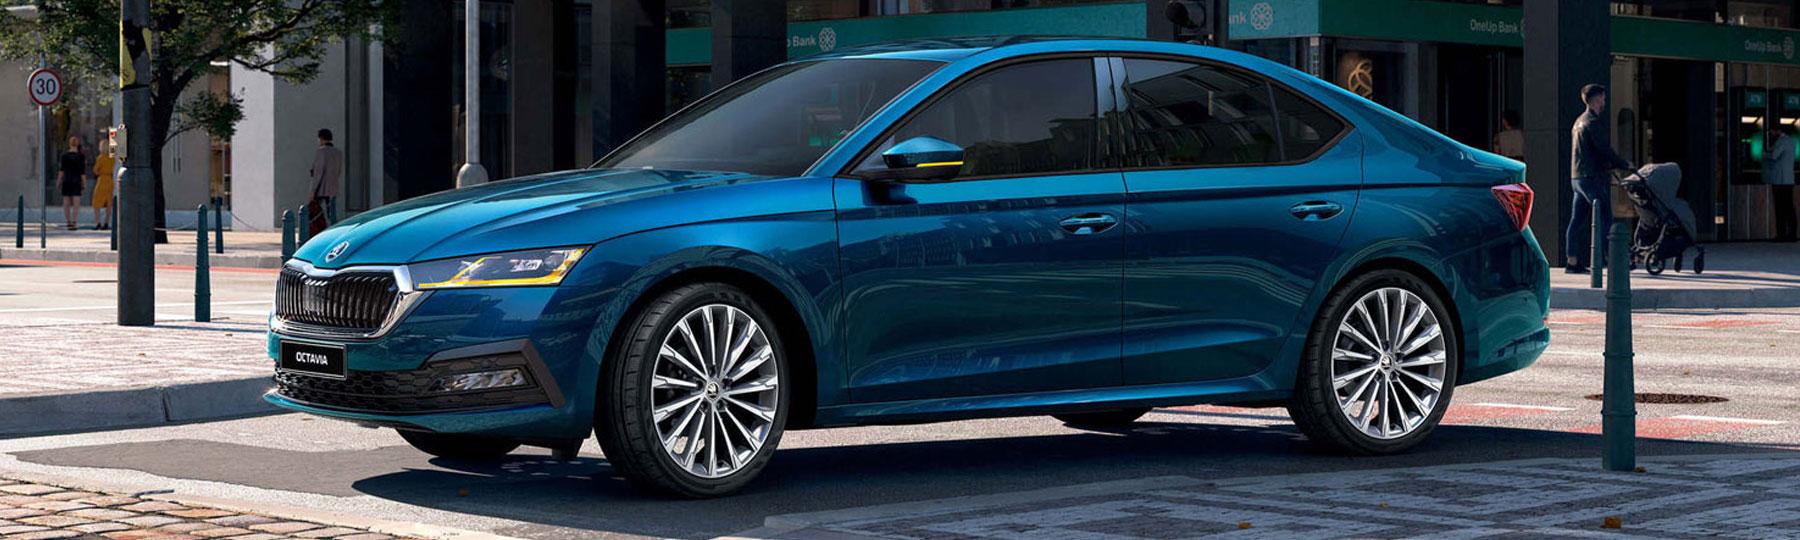 ŠKODA OCTAVIA Hatch New Car Offer